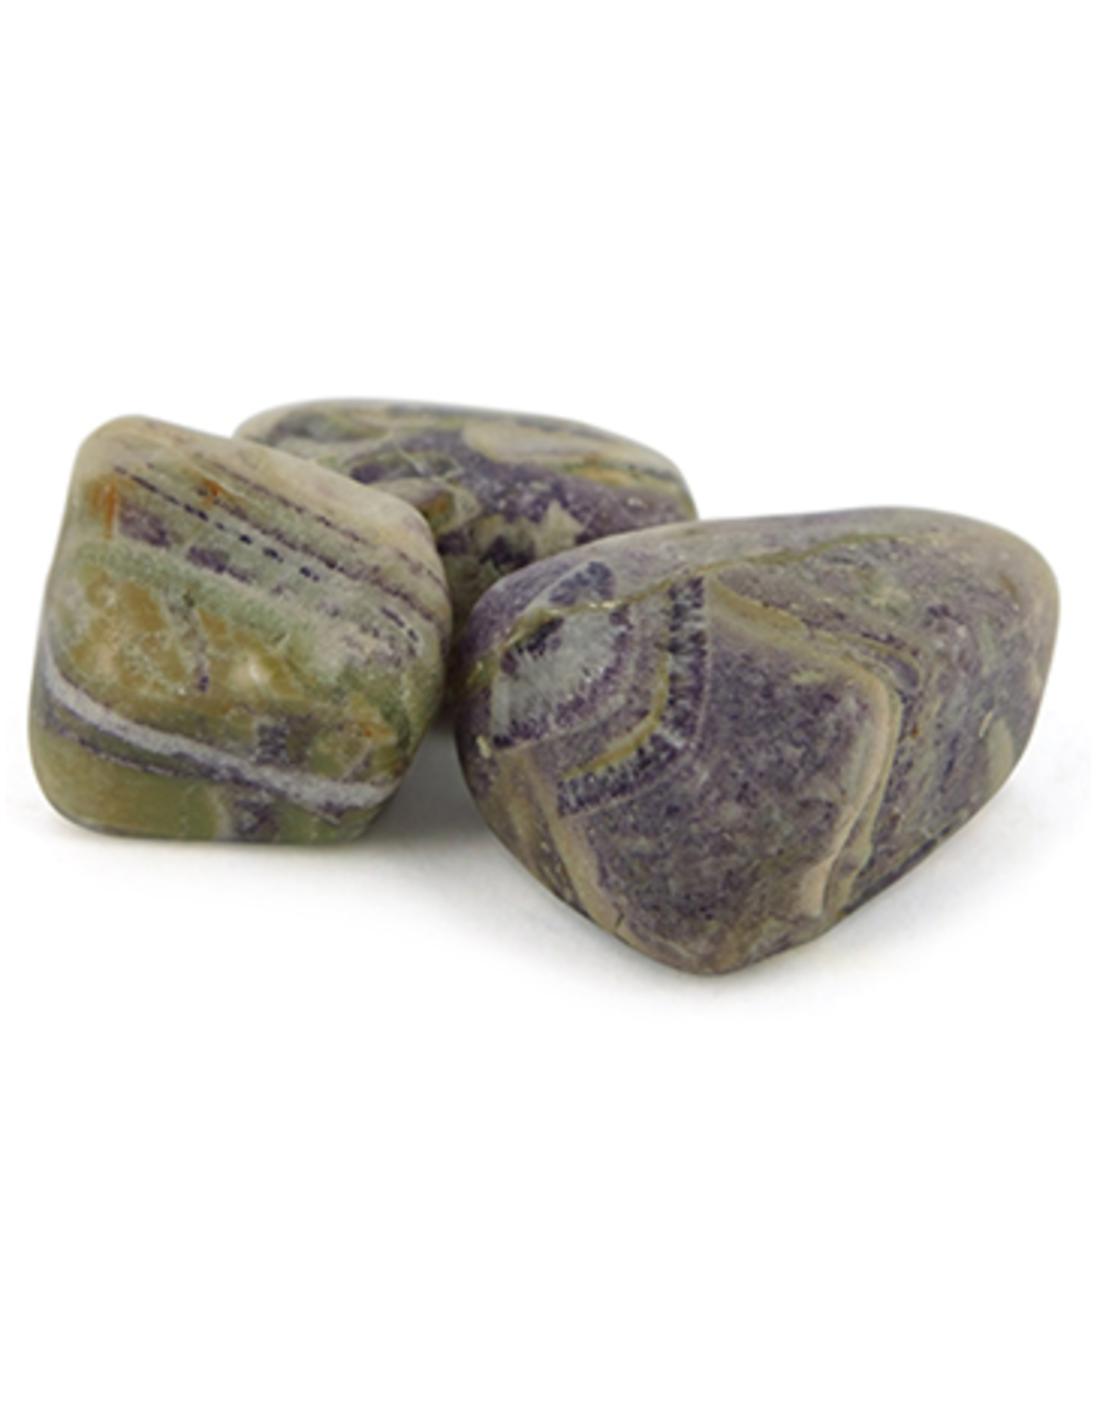 Charoiet B 50 gr. trommelstenen (mt3)